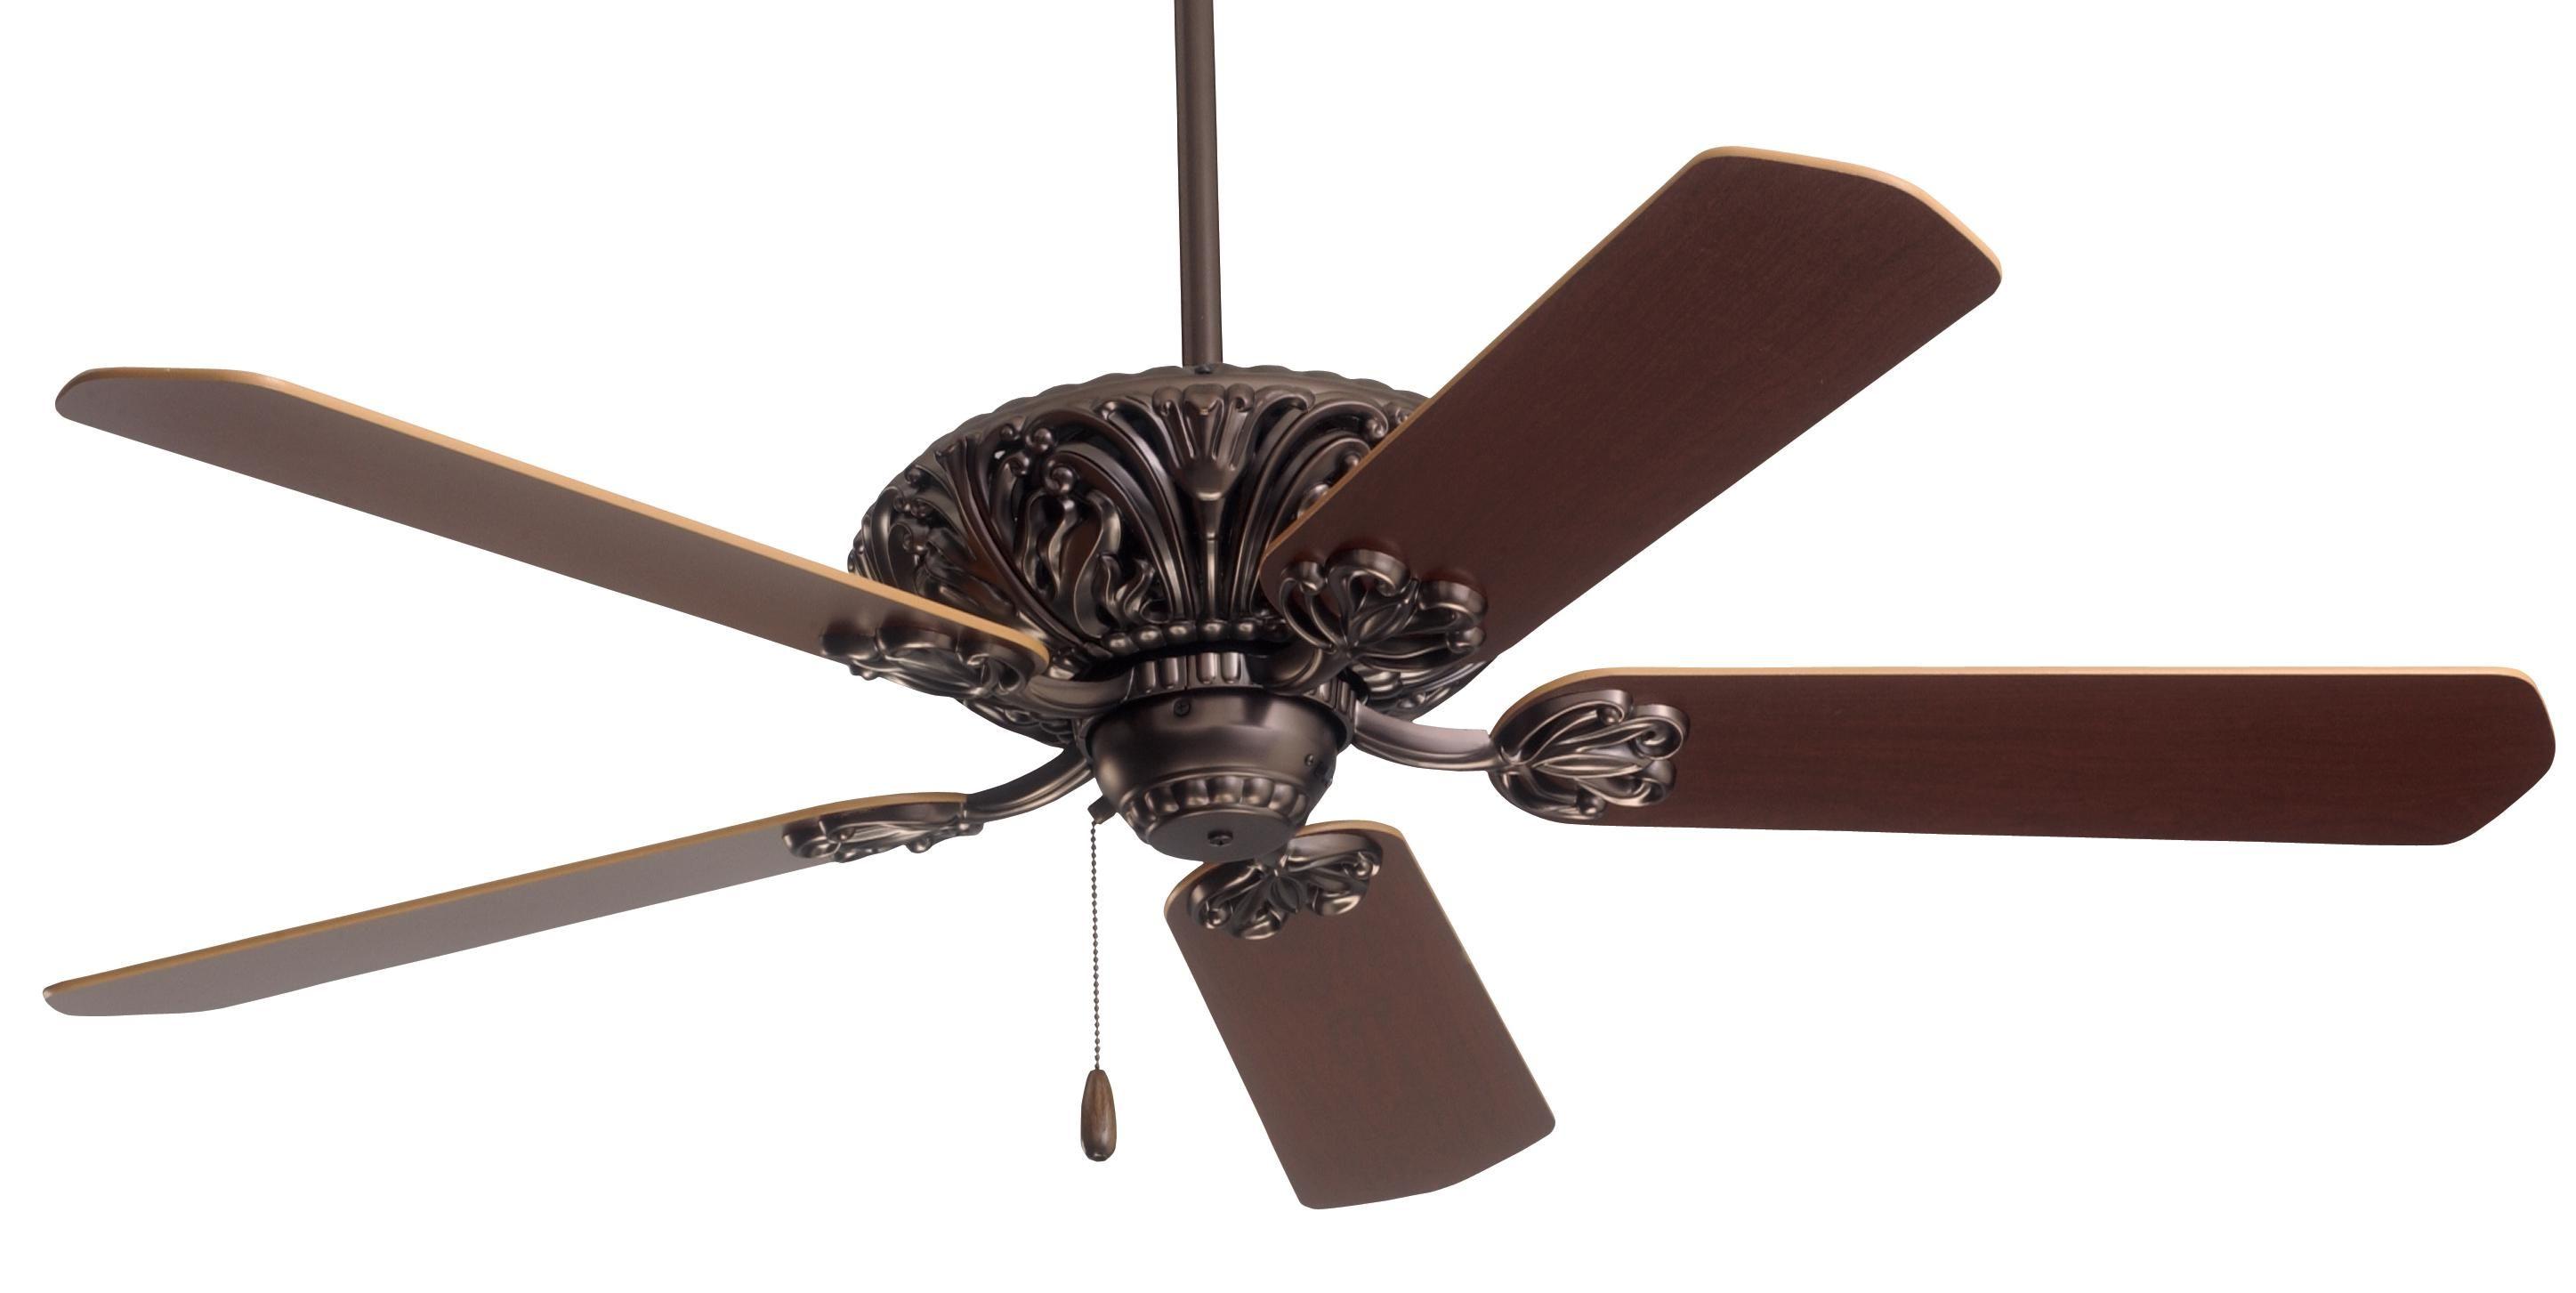 Unusual ceiling fans emerson zurich ceiling fan cf935orb in oil rubbed bronze guaranteed